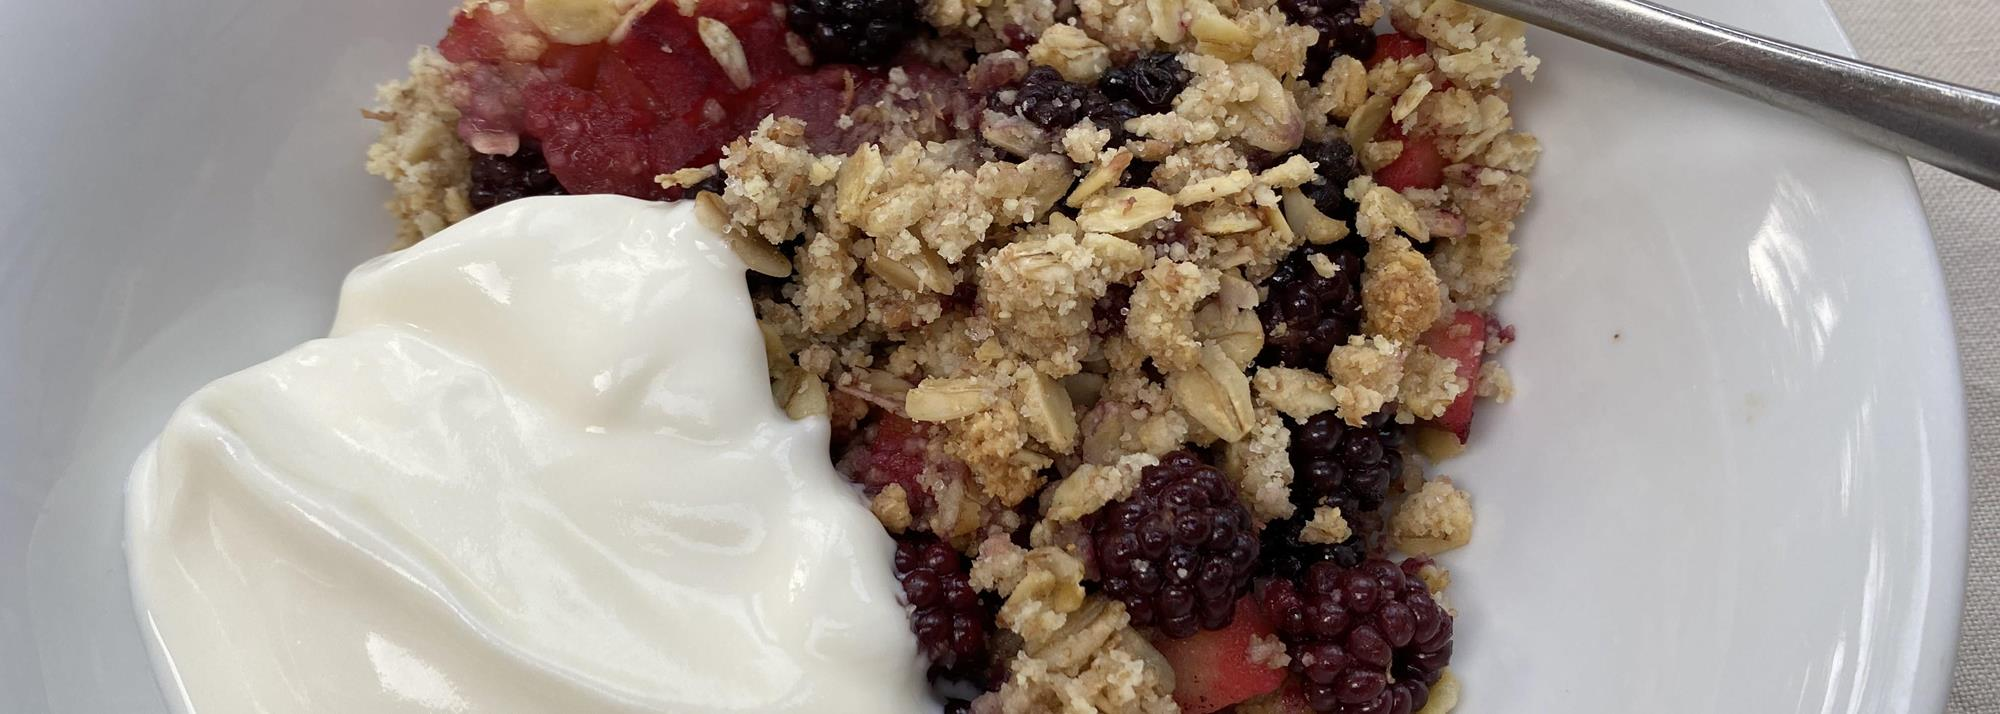 Recipe: blackberry and apple crumble